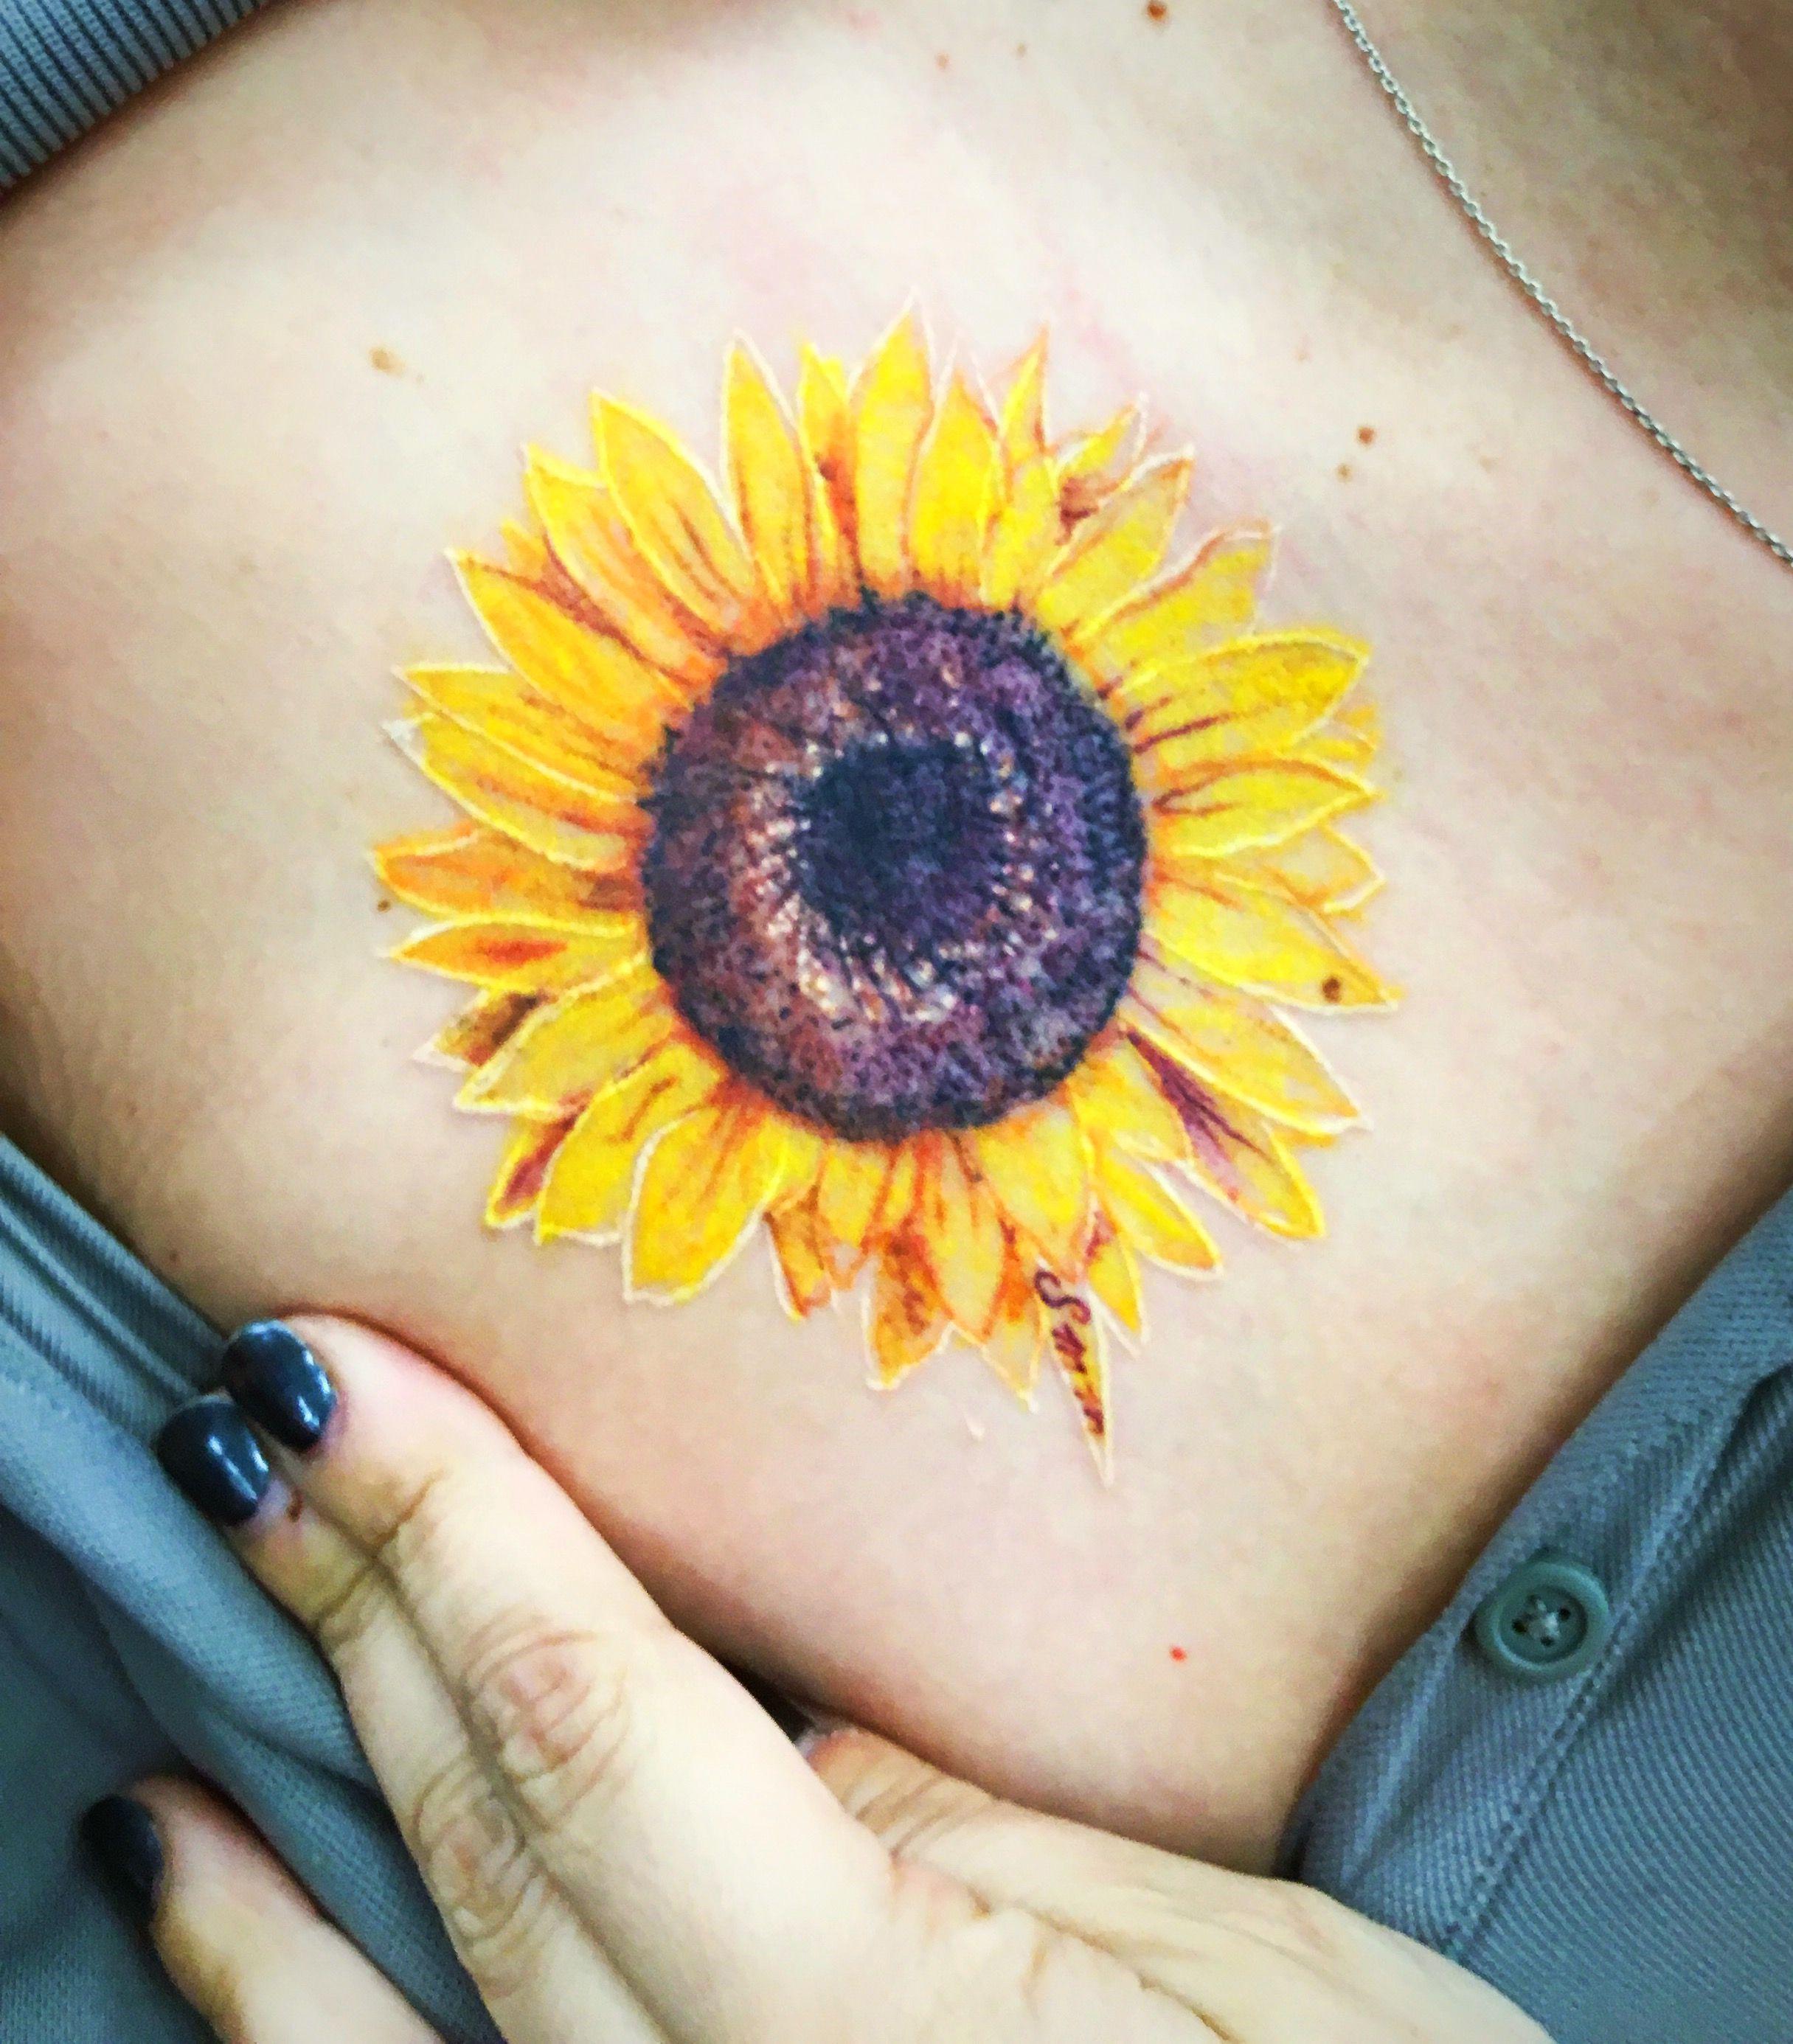 Tattoo Ideas Sunflower: #sunflower #tattoo